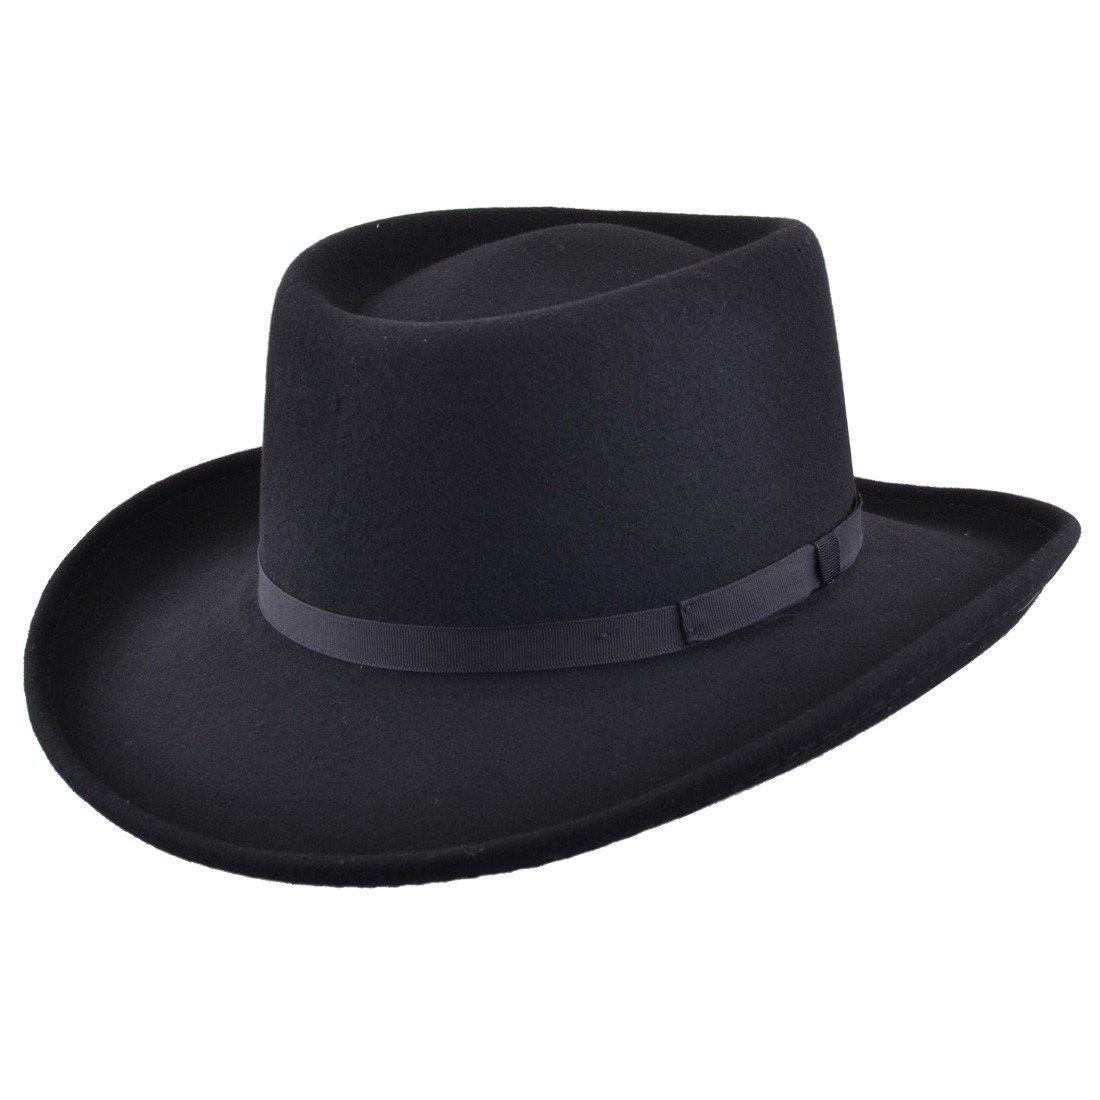 Gambler Cowboy Hat Black Wool Felt with Ribbon Trim